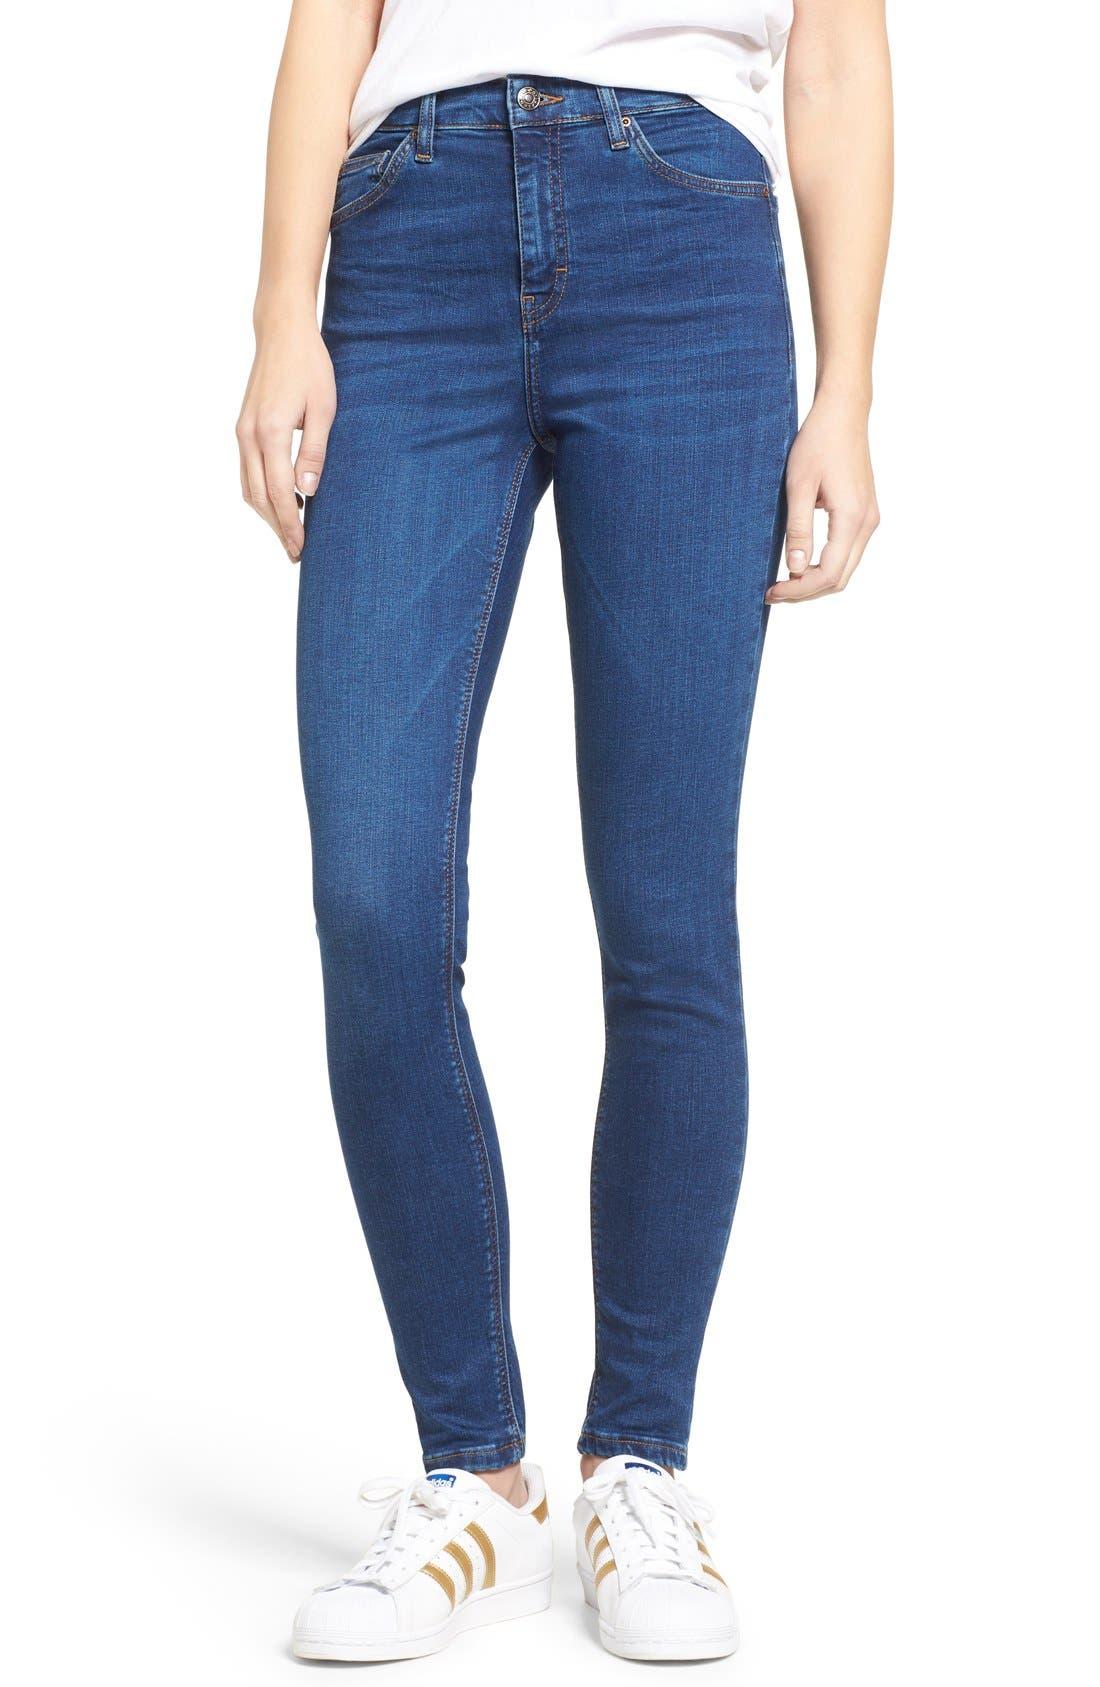 Topshop Jamie High Waist Ankle Skinny Jeans